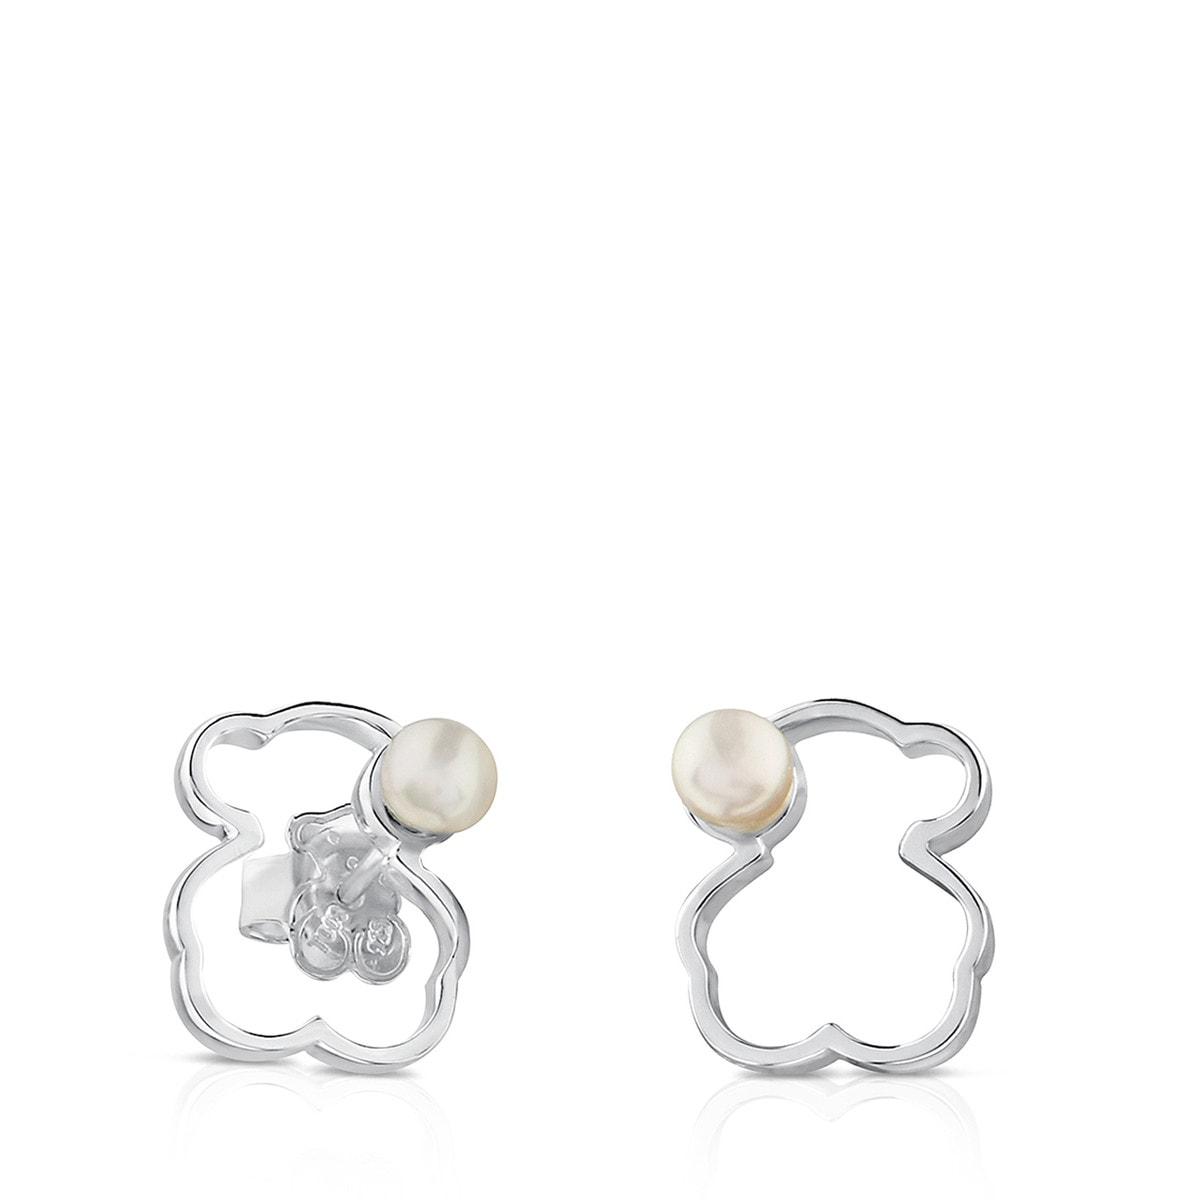 Silver Silueta Earrings With Pearl Tous Site Us